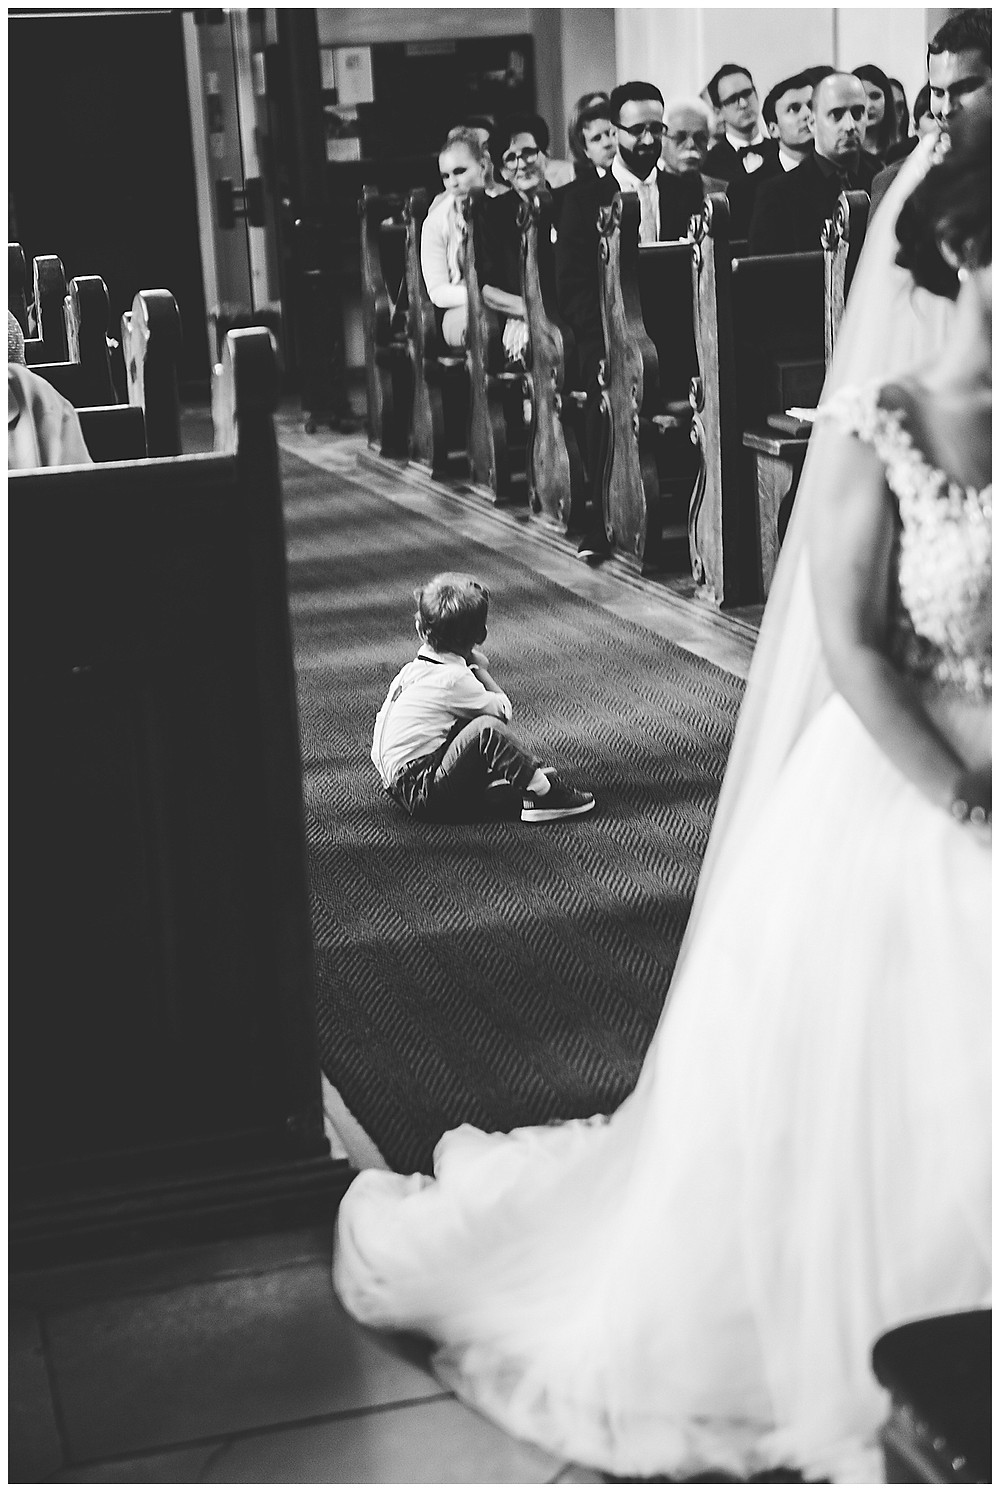 Kind sitzt in Kirche